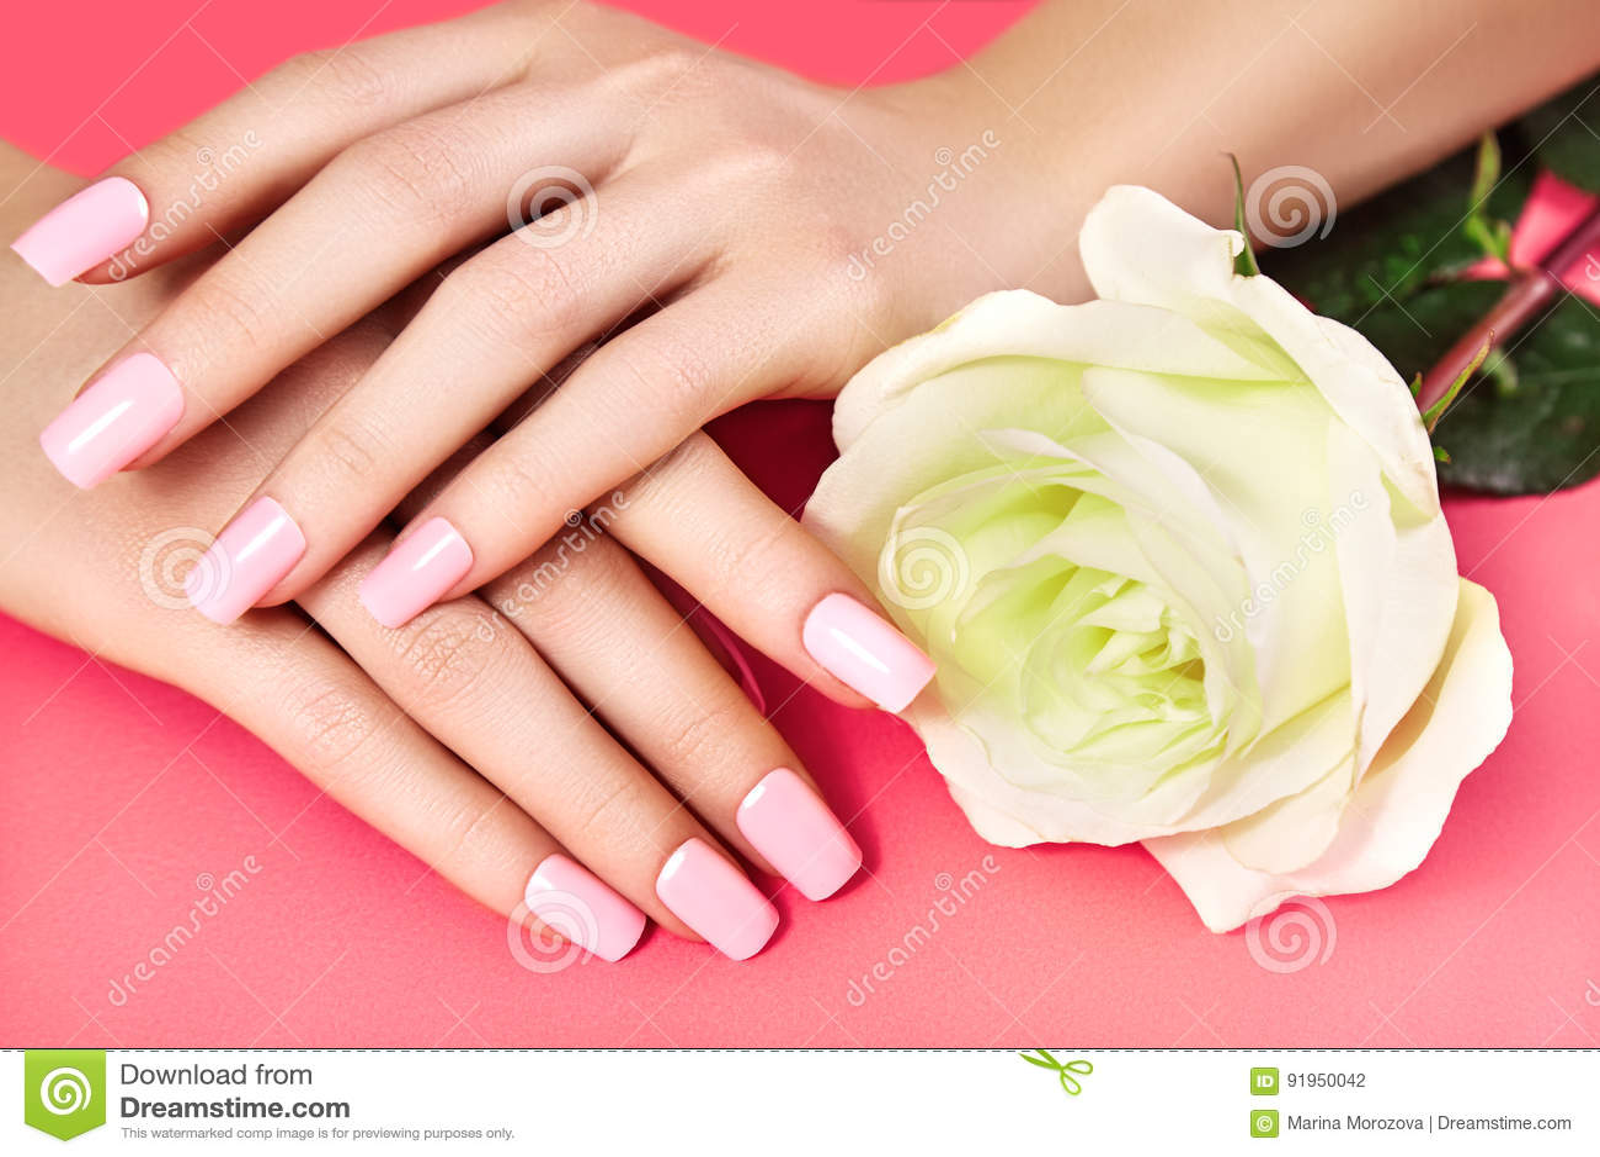 Manicured Nails With Pink Nail Polish Manicure With Nailpolish